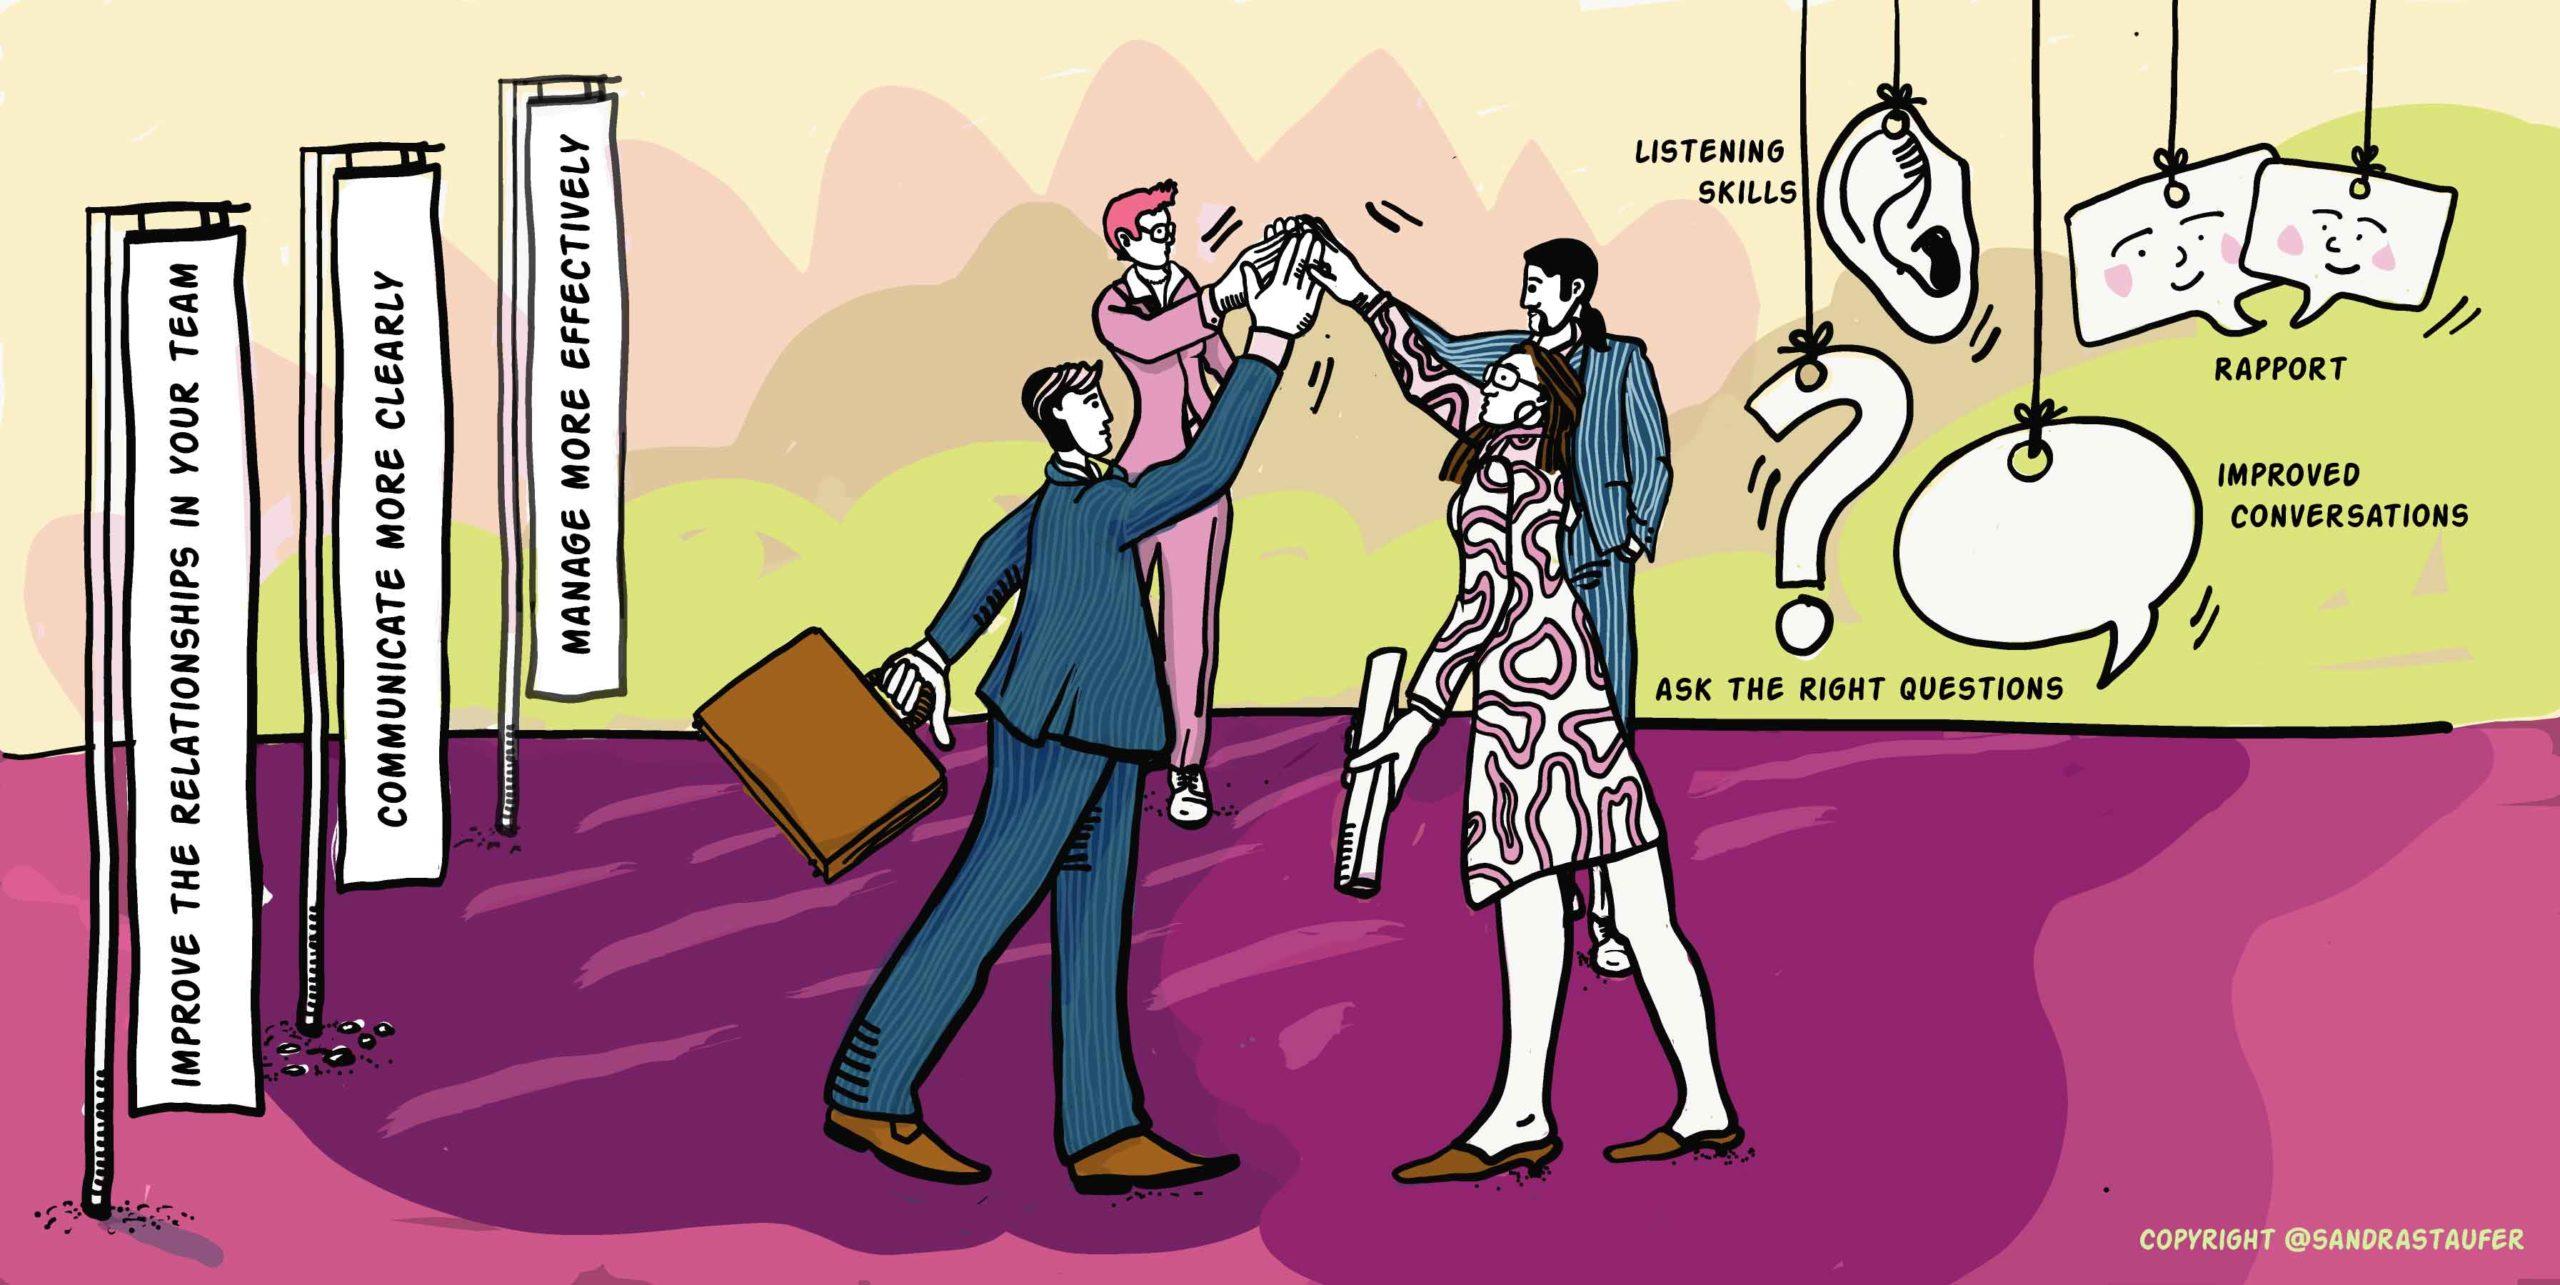 SANDRA STAUFER ILLUSTARTION FOR HEADS-UP COACHING